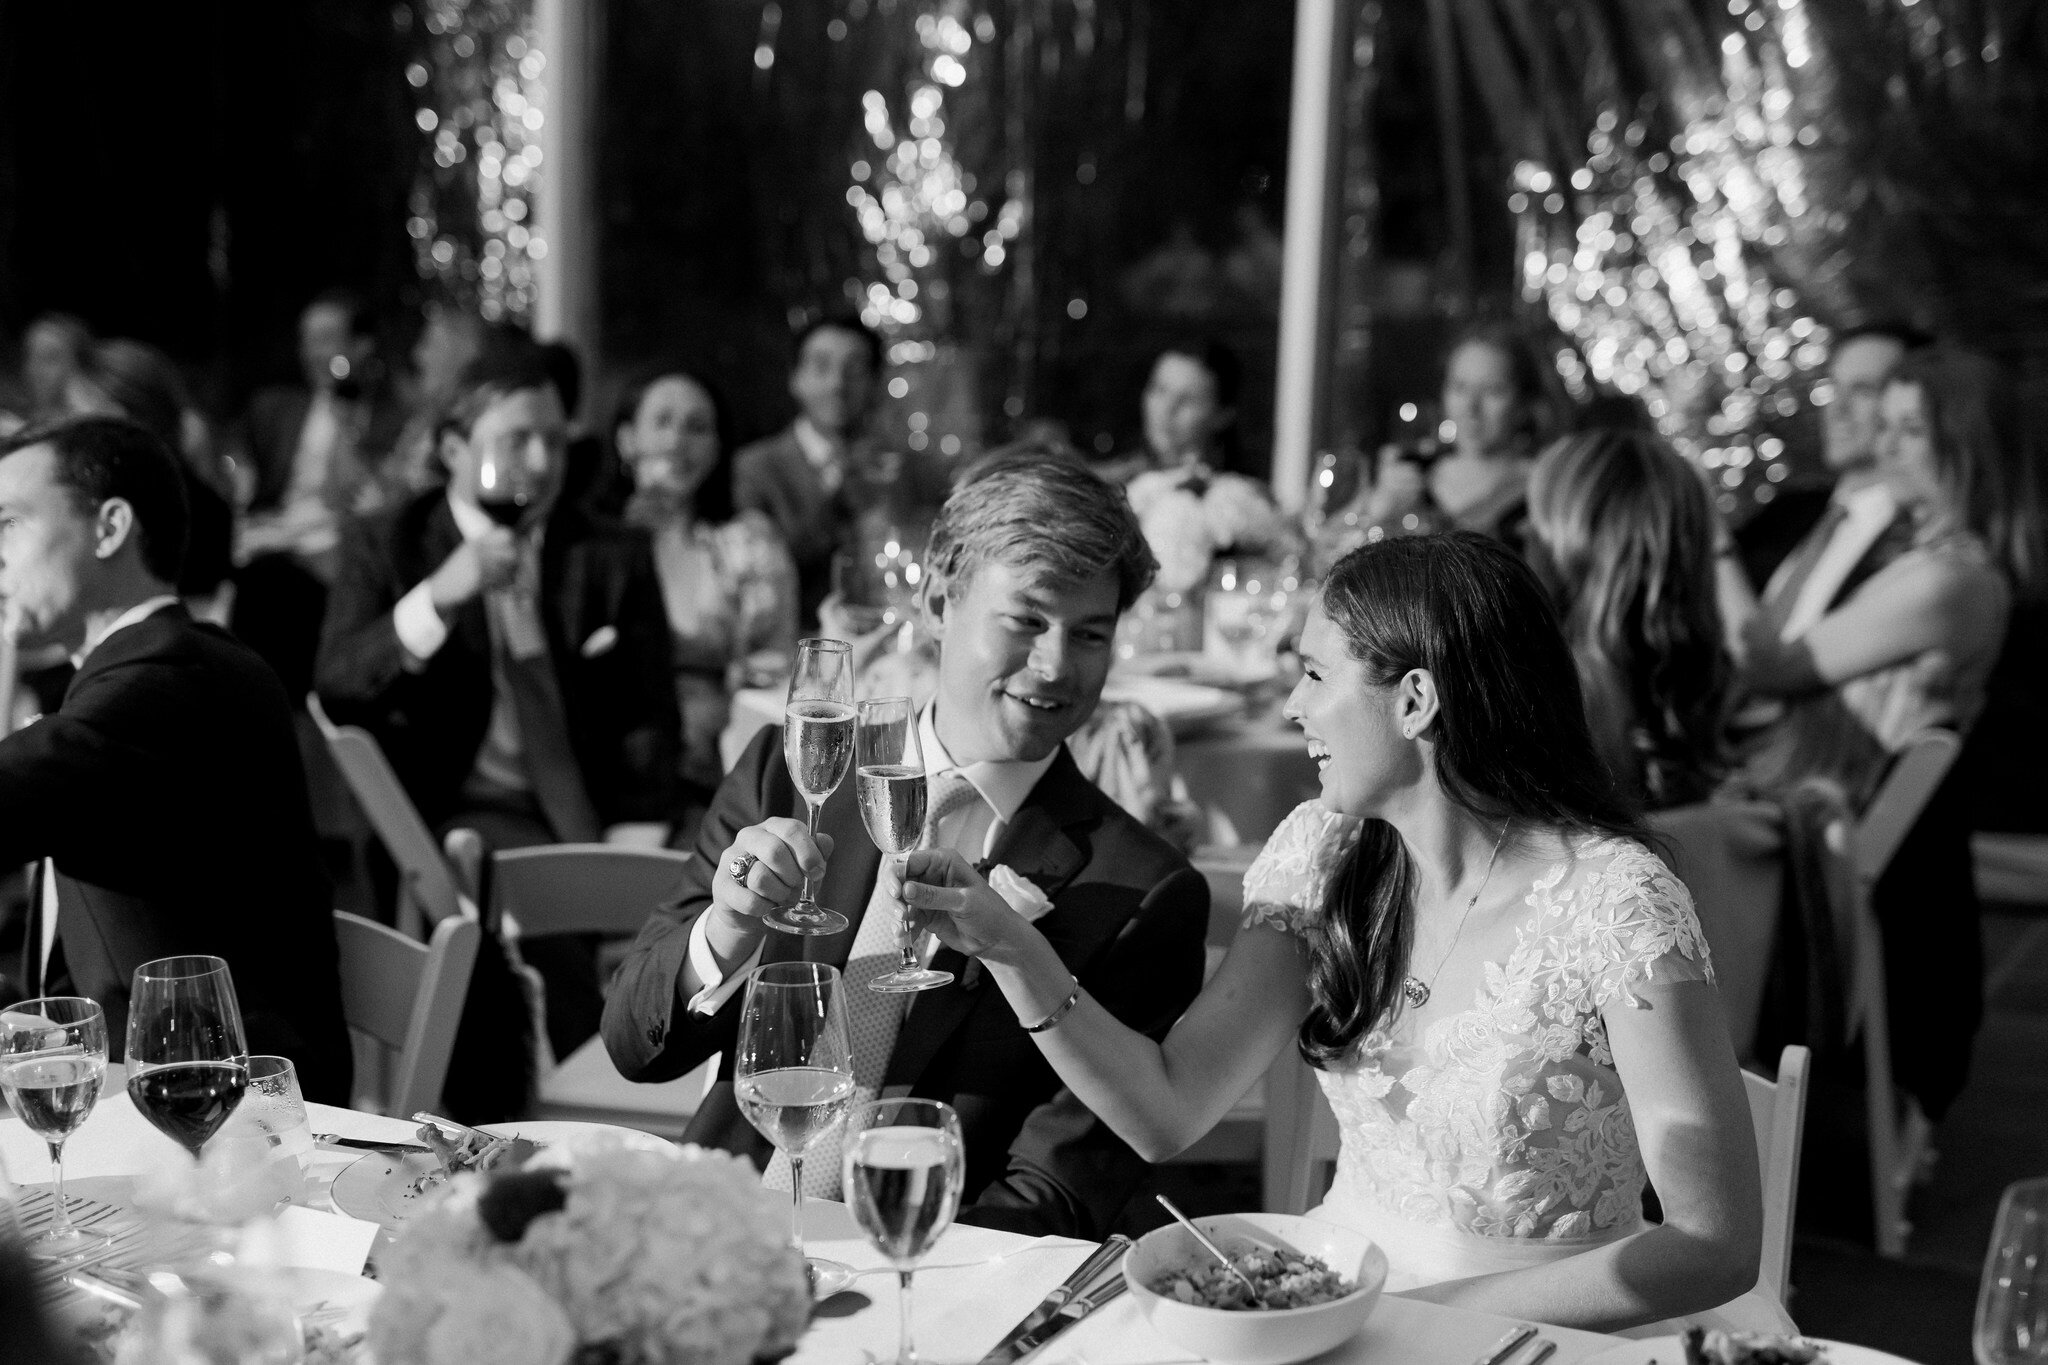 greenwich wedding_belle haven club wedding _ct wedding photographer-48_Easy-Resize.com.jpg